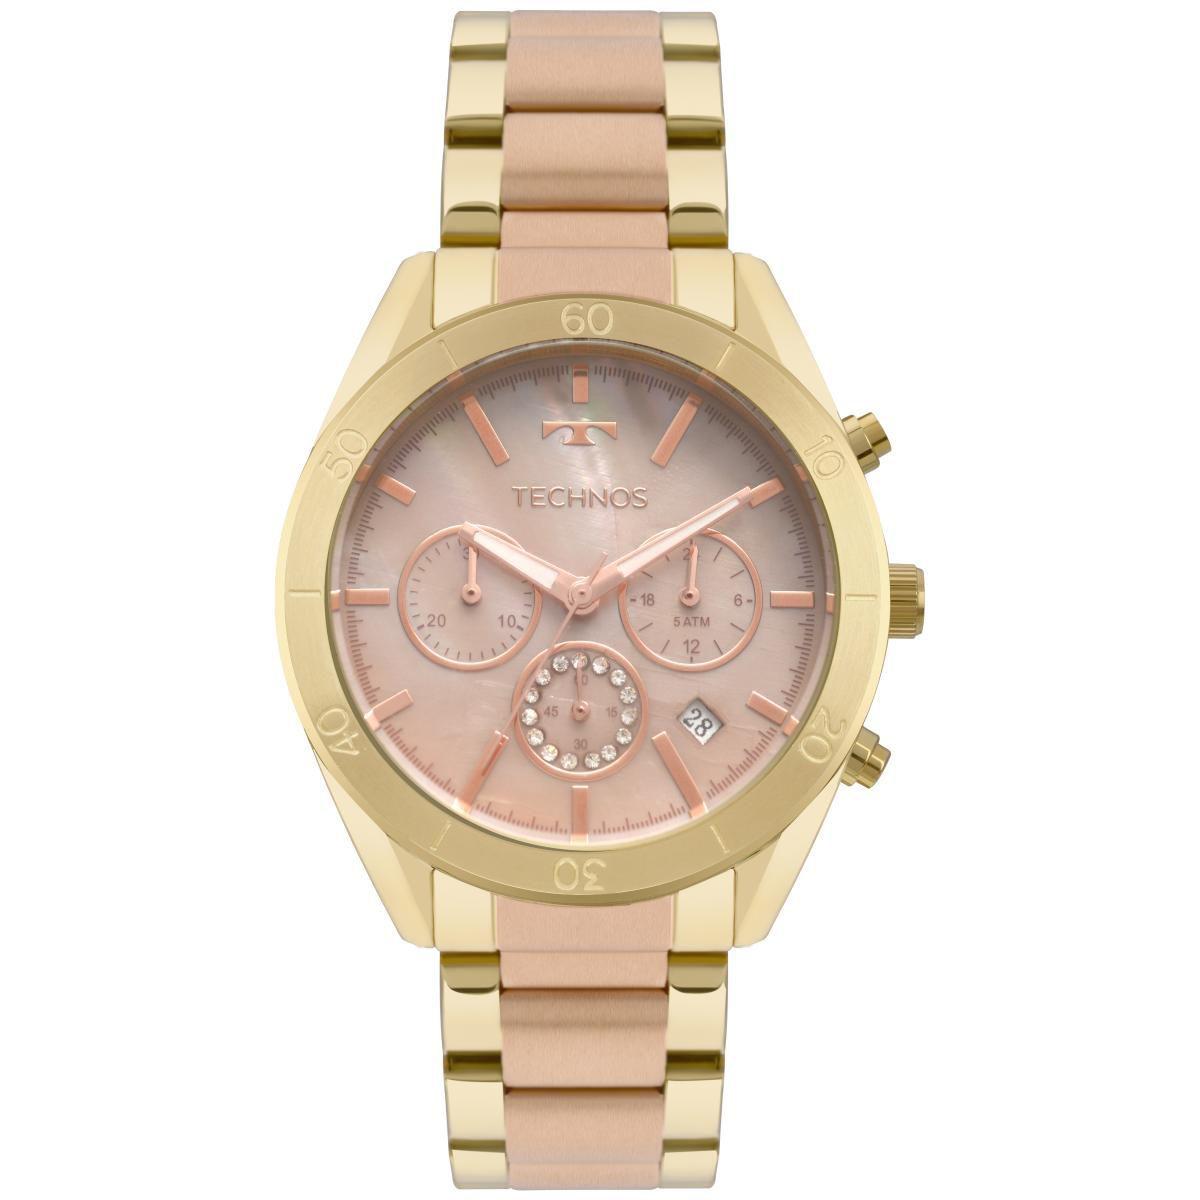 Relógio Feminino Technos Elegance Ladies JS25BW/5M 40mm Aço Dourado/Rose